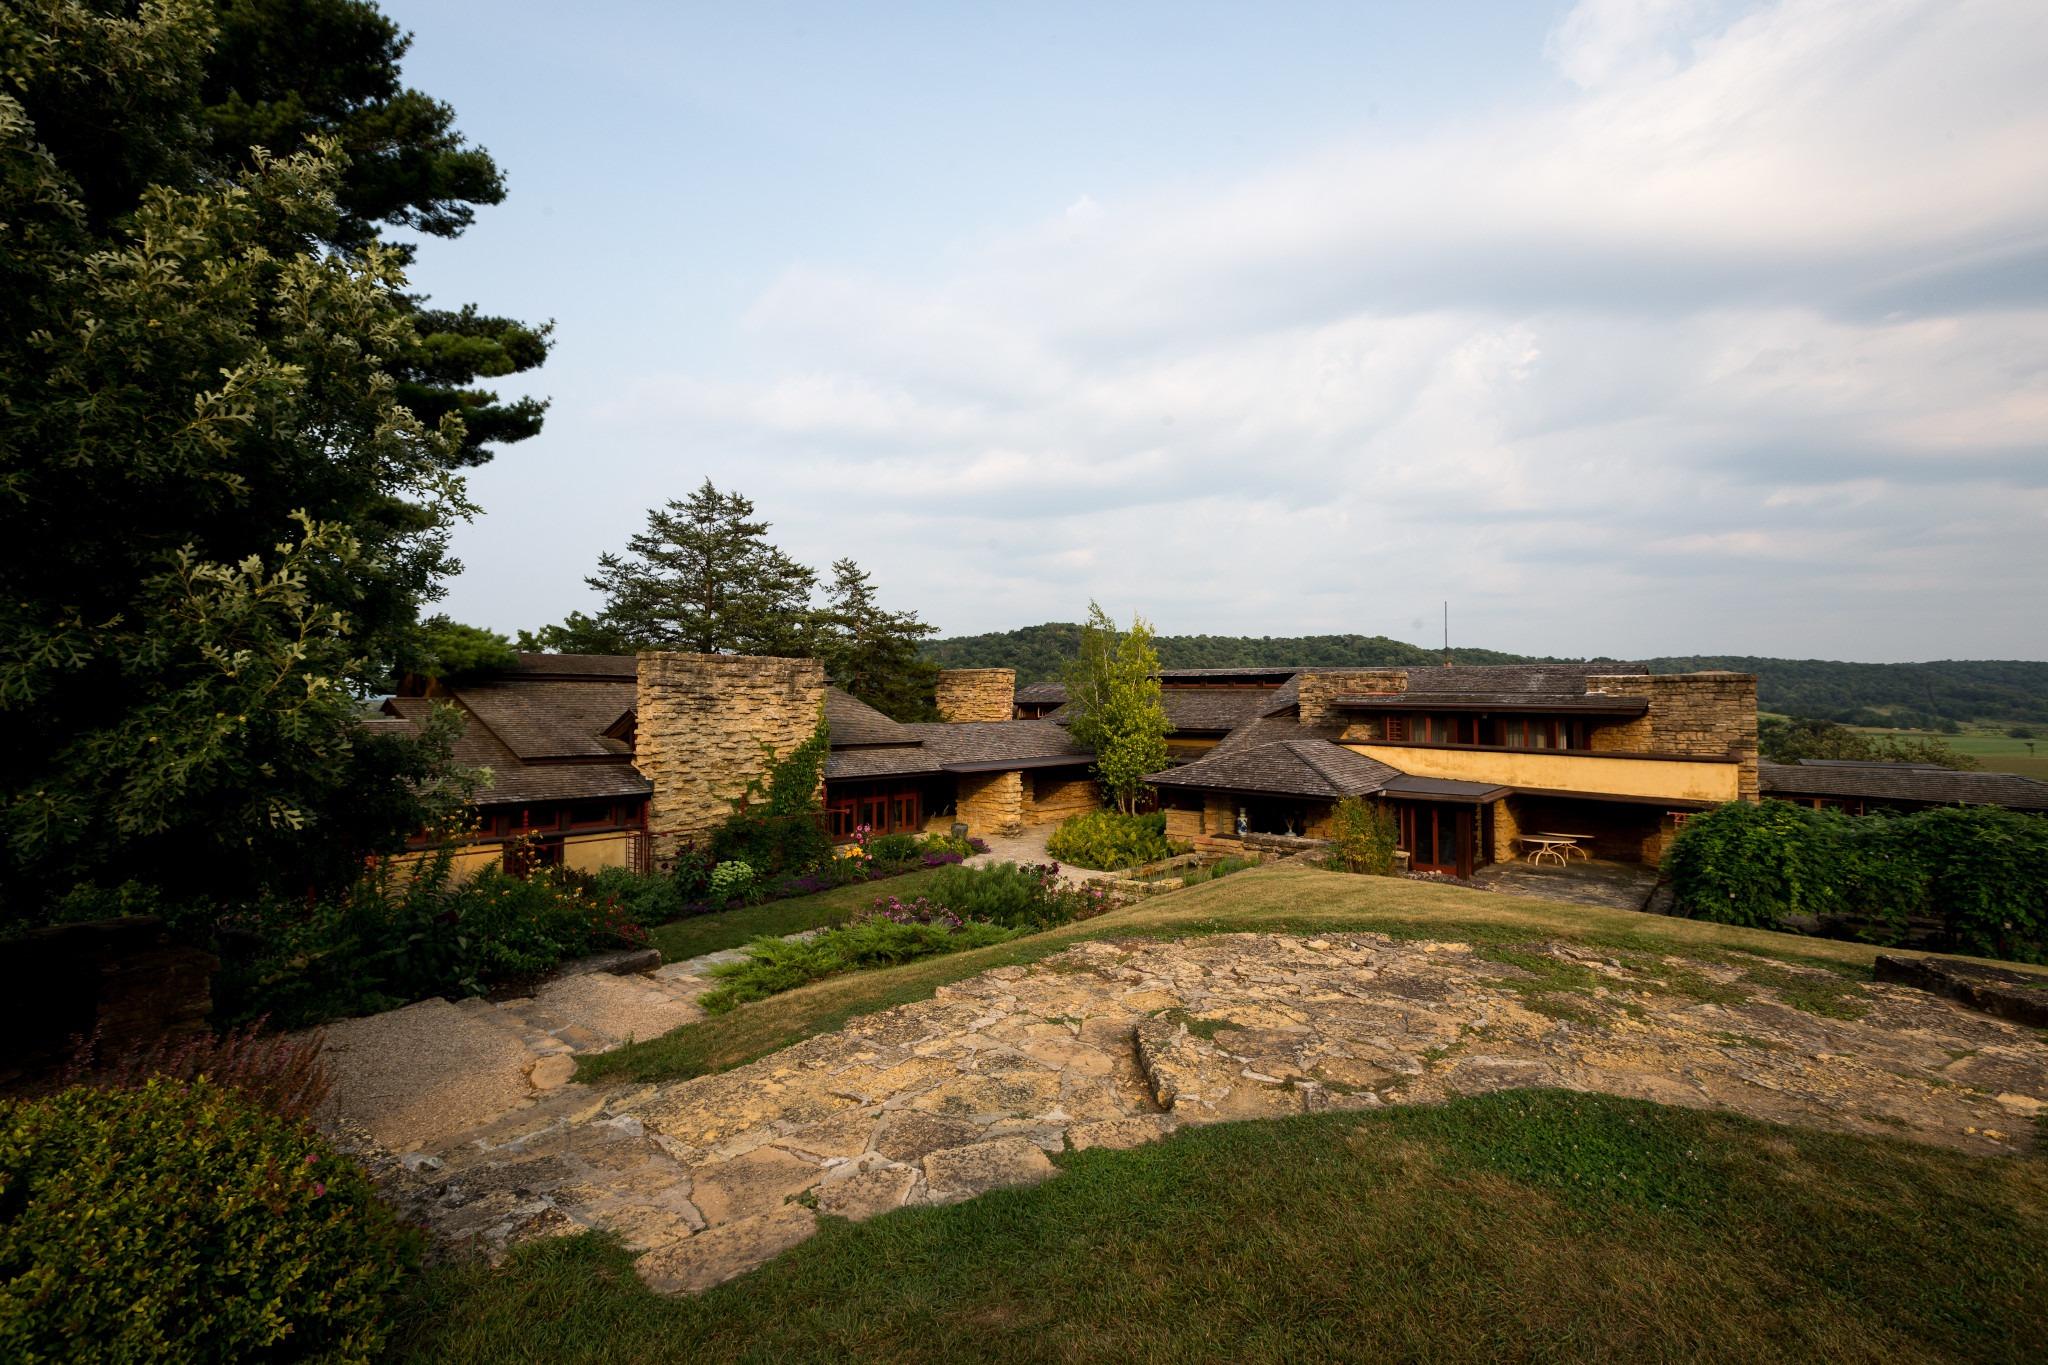 Frank Lloyd Wright's Taliesin in Spring Green Wisconsin